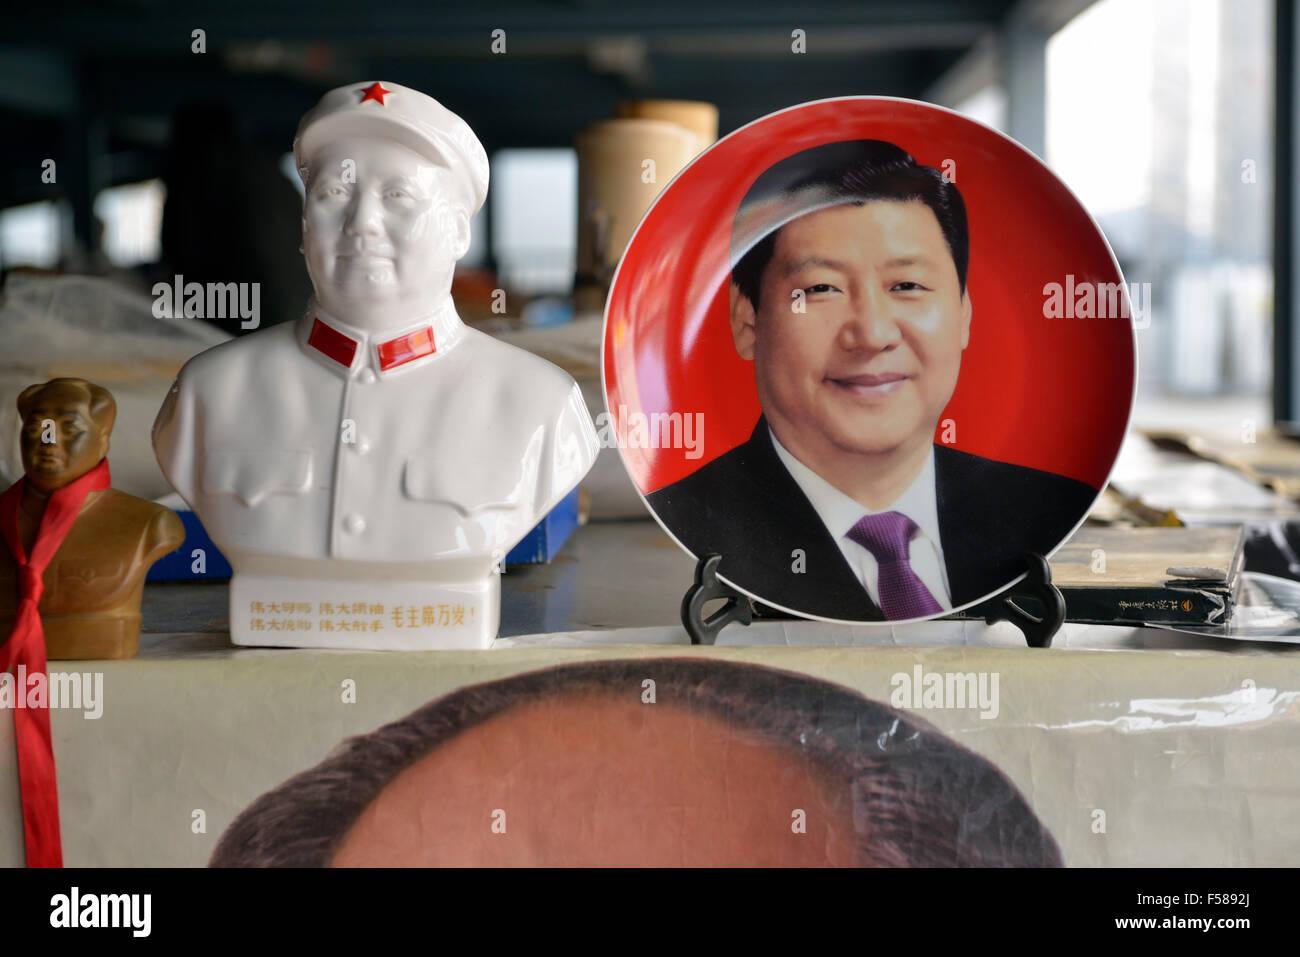 Memorabilia of Chinese president Xi Jinping is on sale with that of Mao Zedong in Panjiayuan flea market in Beijing, - Stock Image